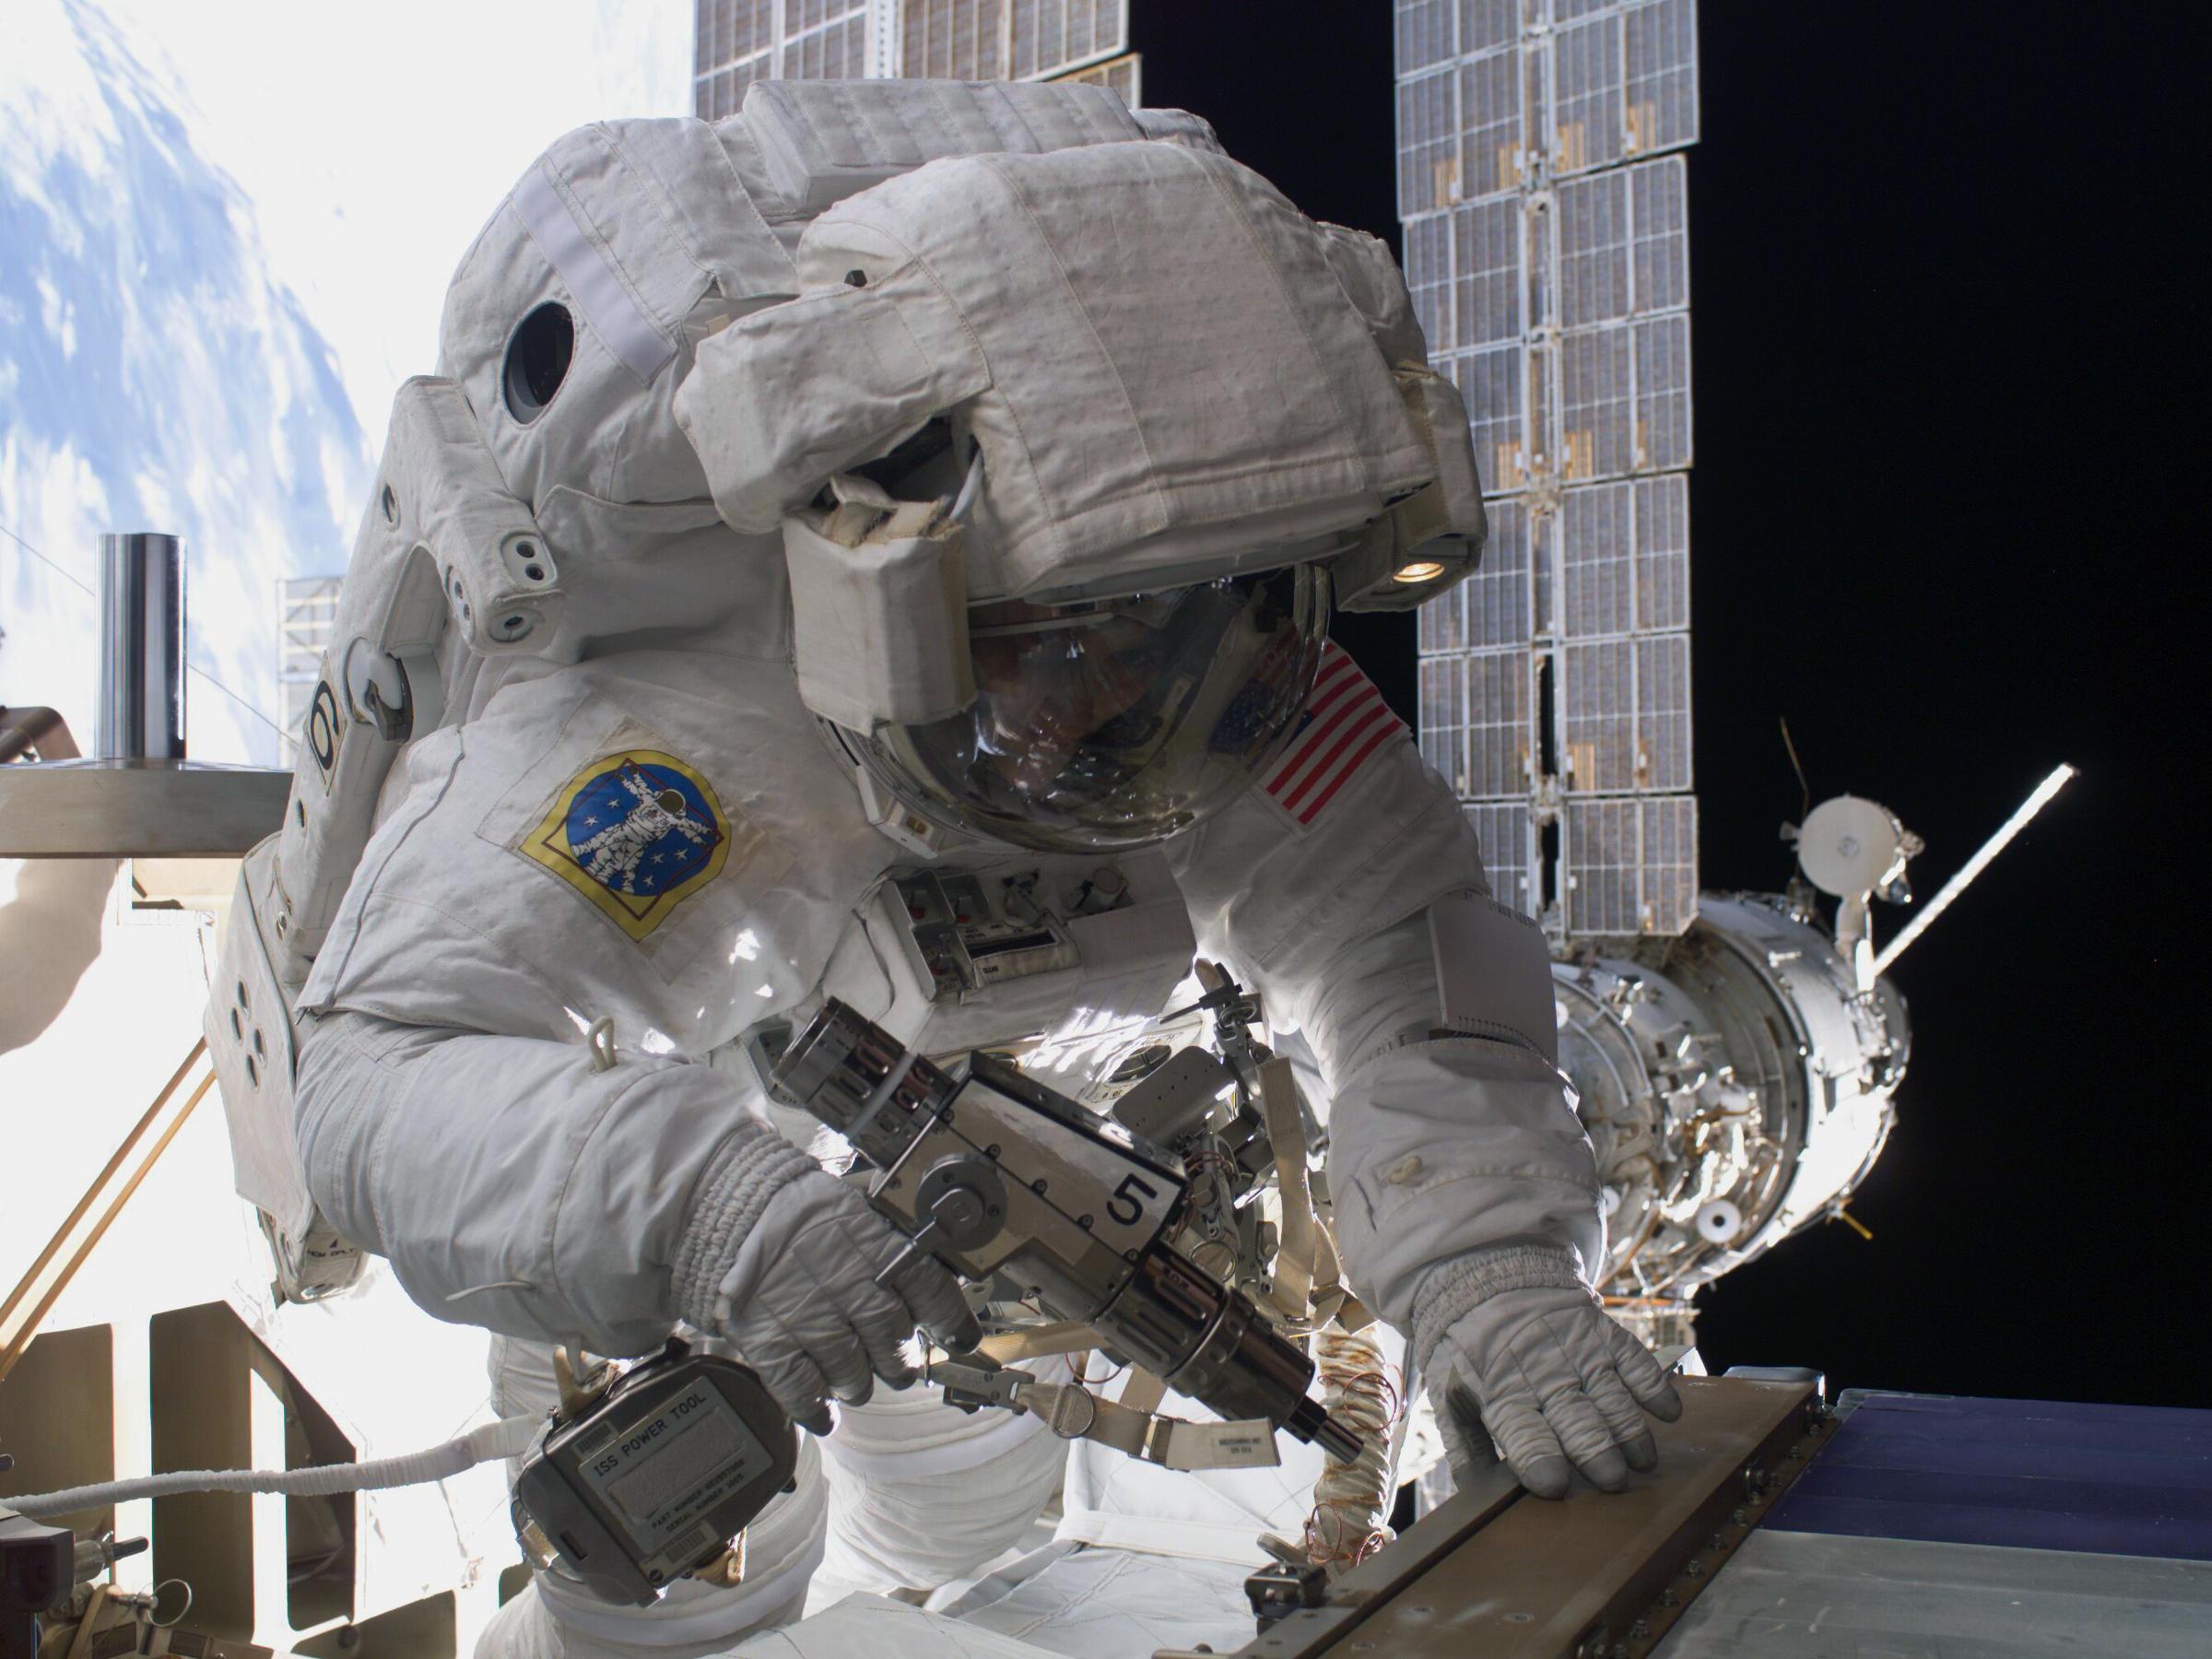 astronaut orbiting space station - photo #29